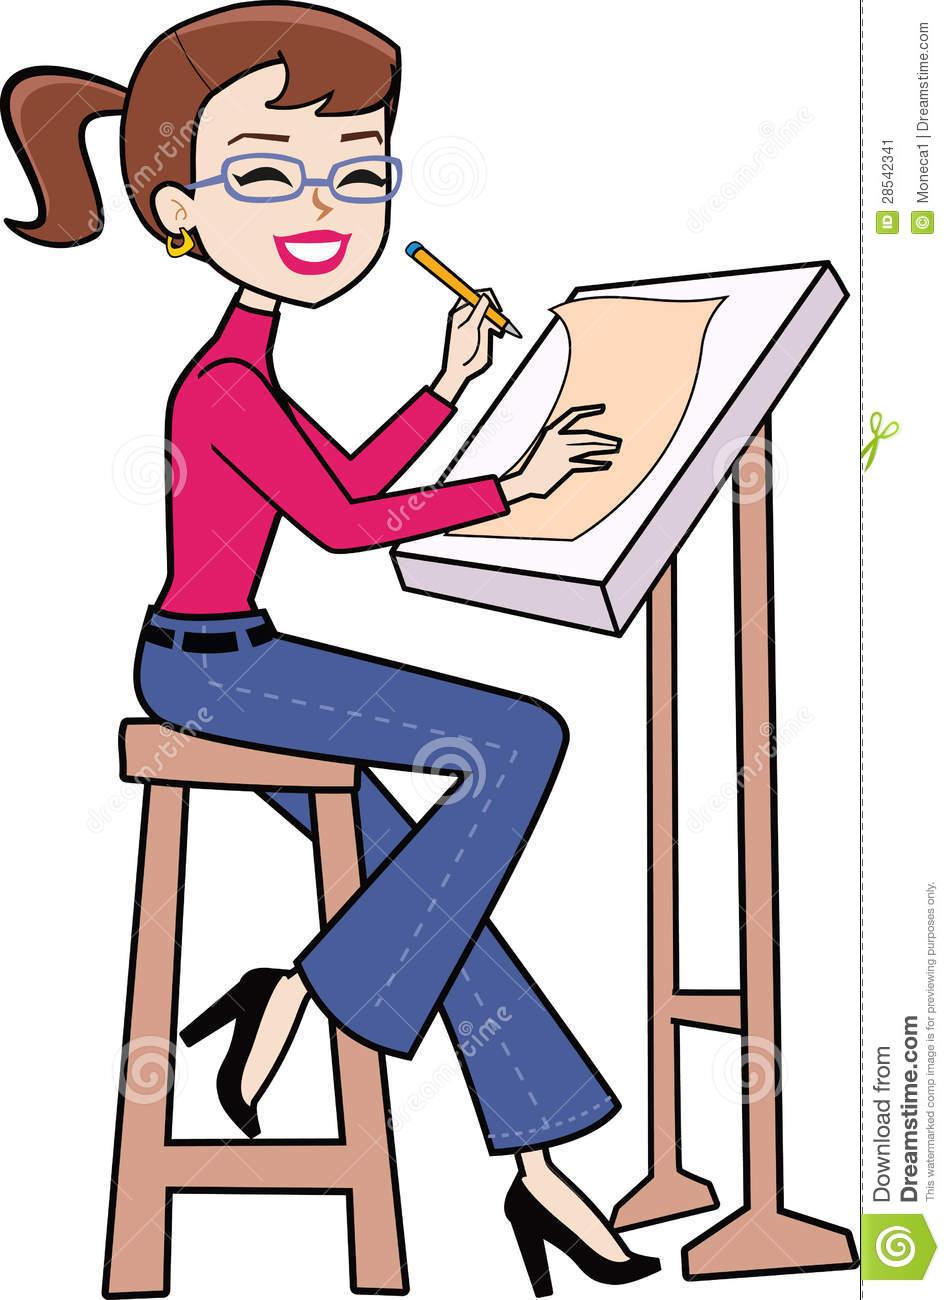 Draw clipart woman artist, Draw woman artist Transparent.